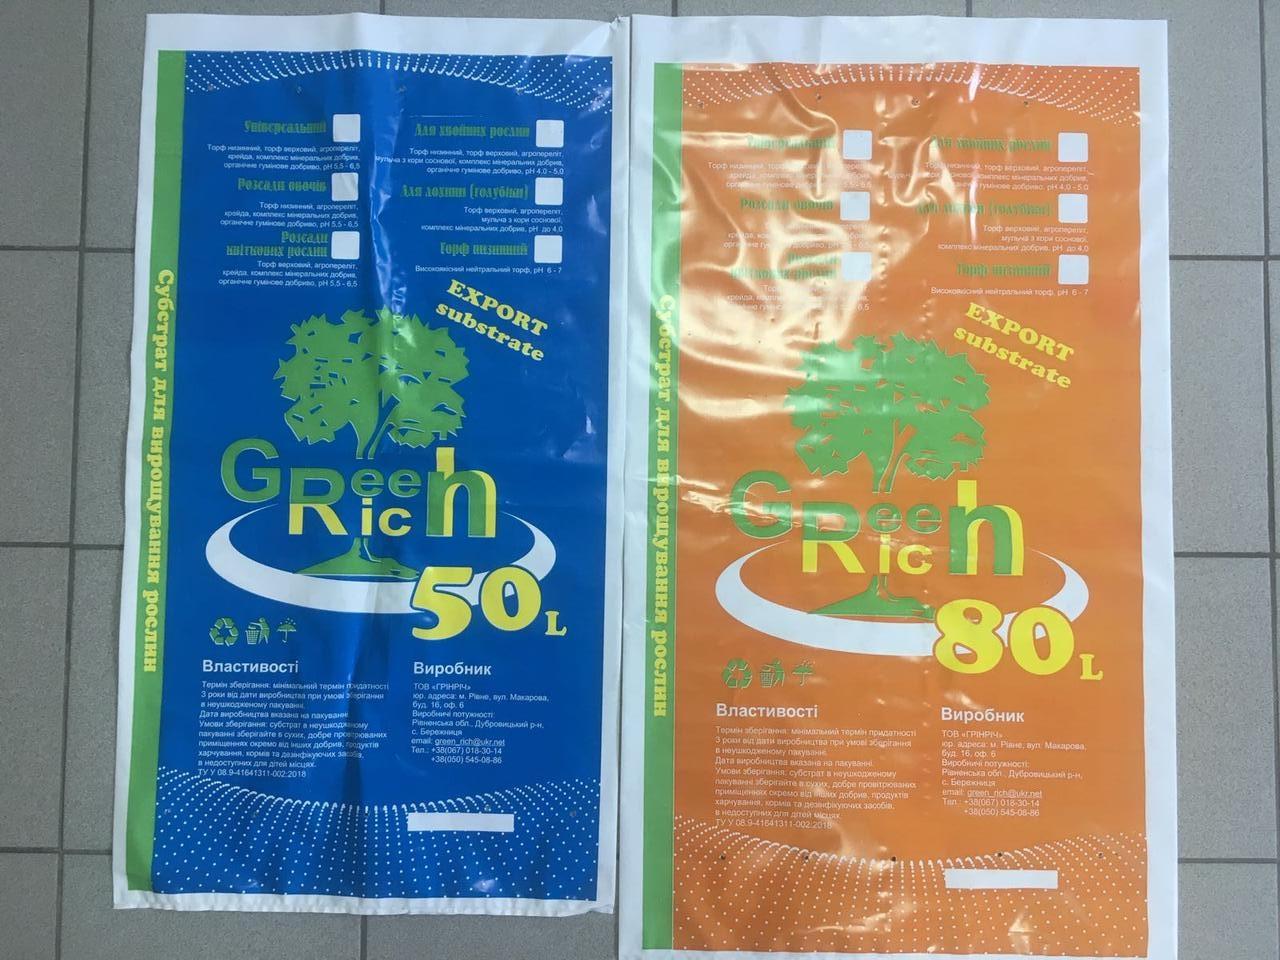 "Субстрат для розсади овочів ""Грінріч"" 50л"